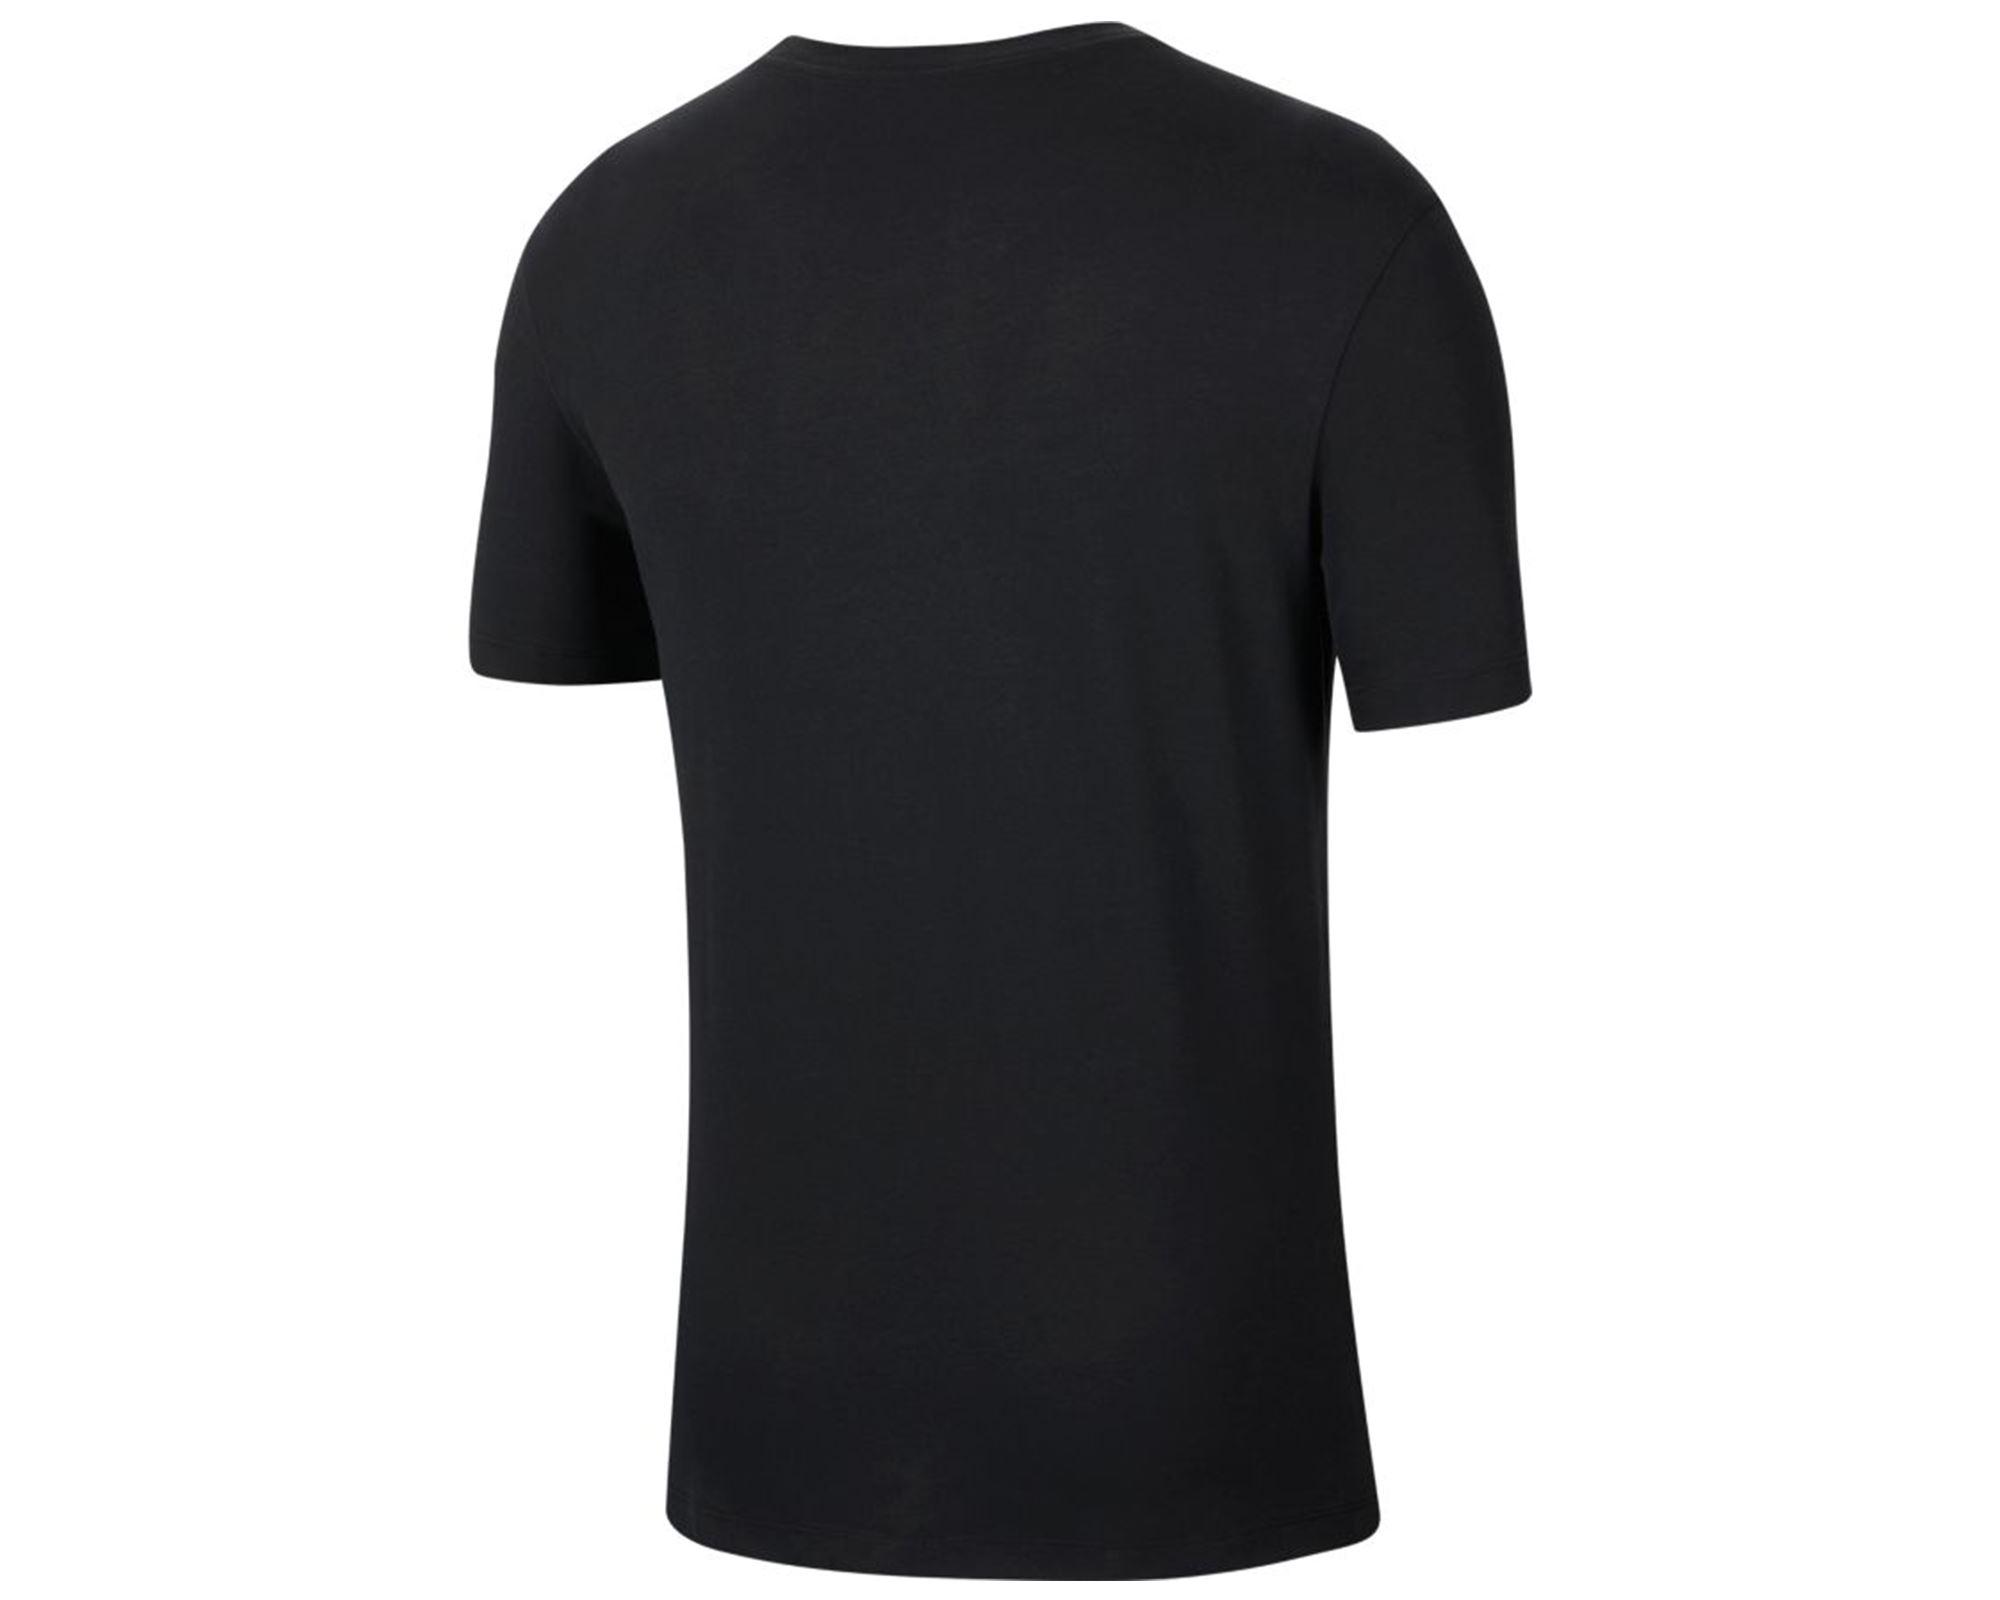 Dri-Fit Erkek Siyah Antrenman Tişörtü (CZ7989-010)